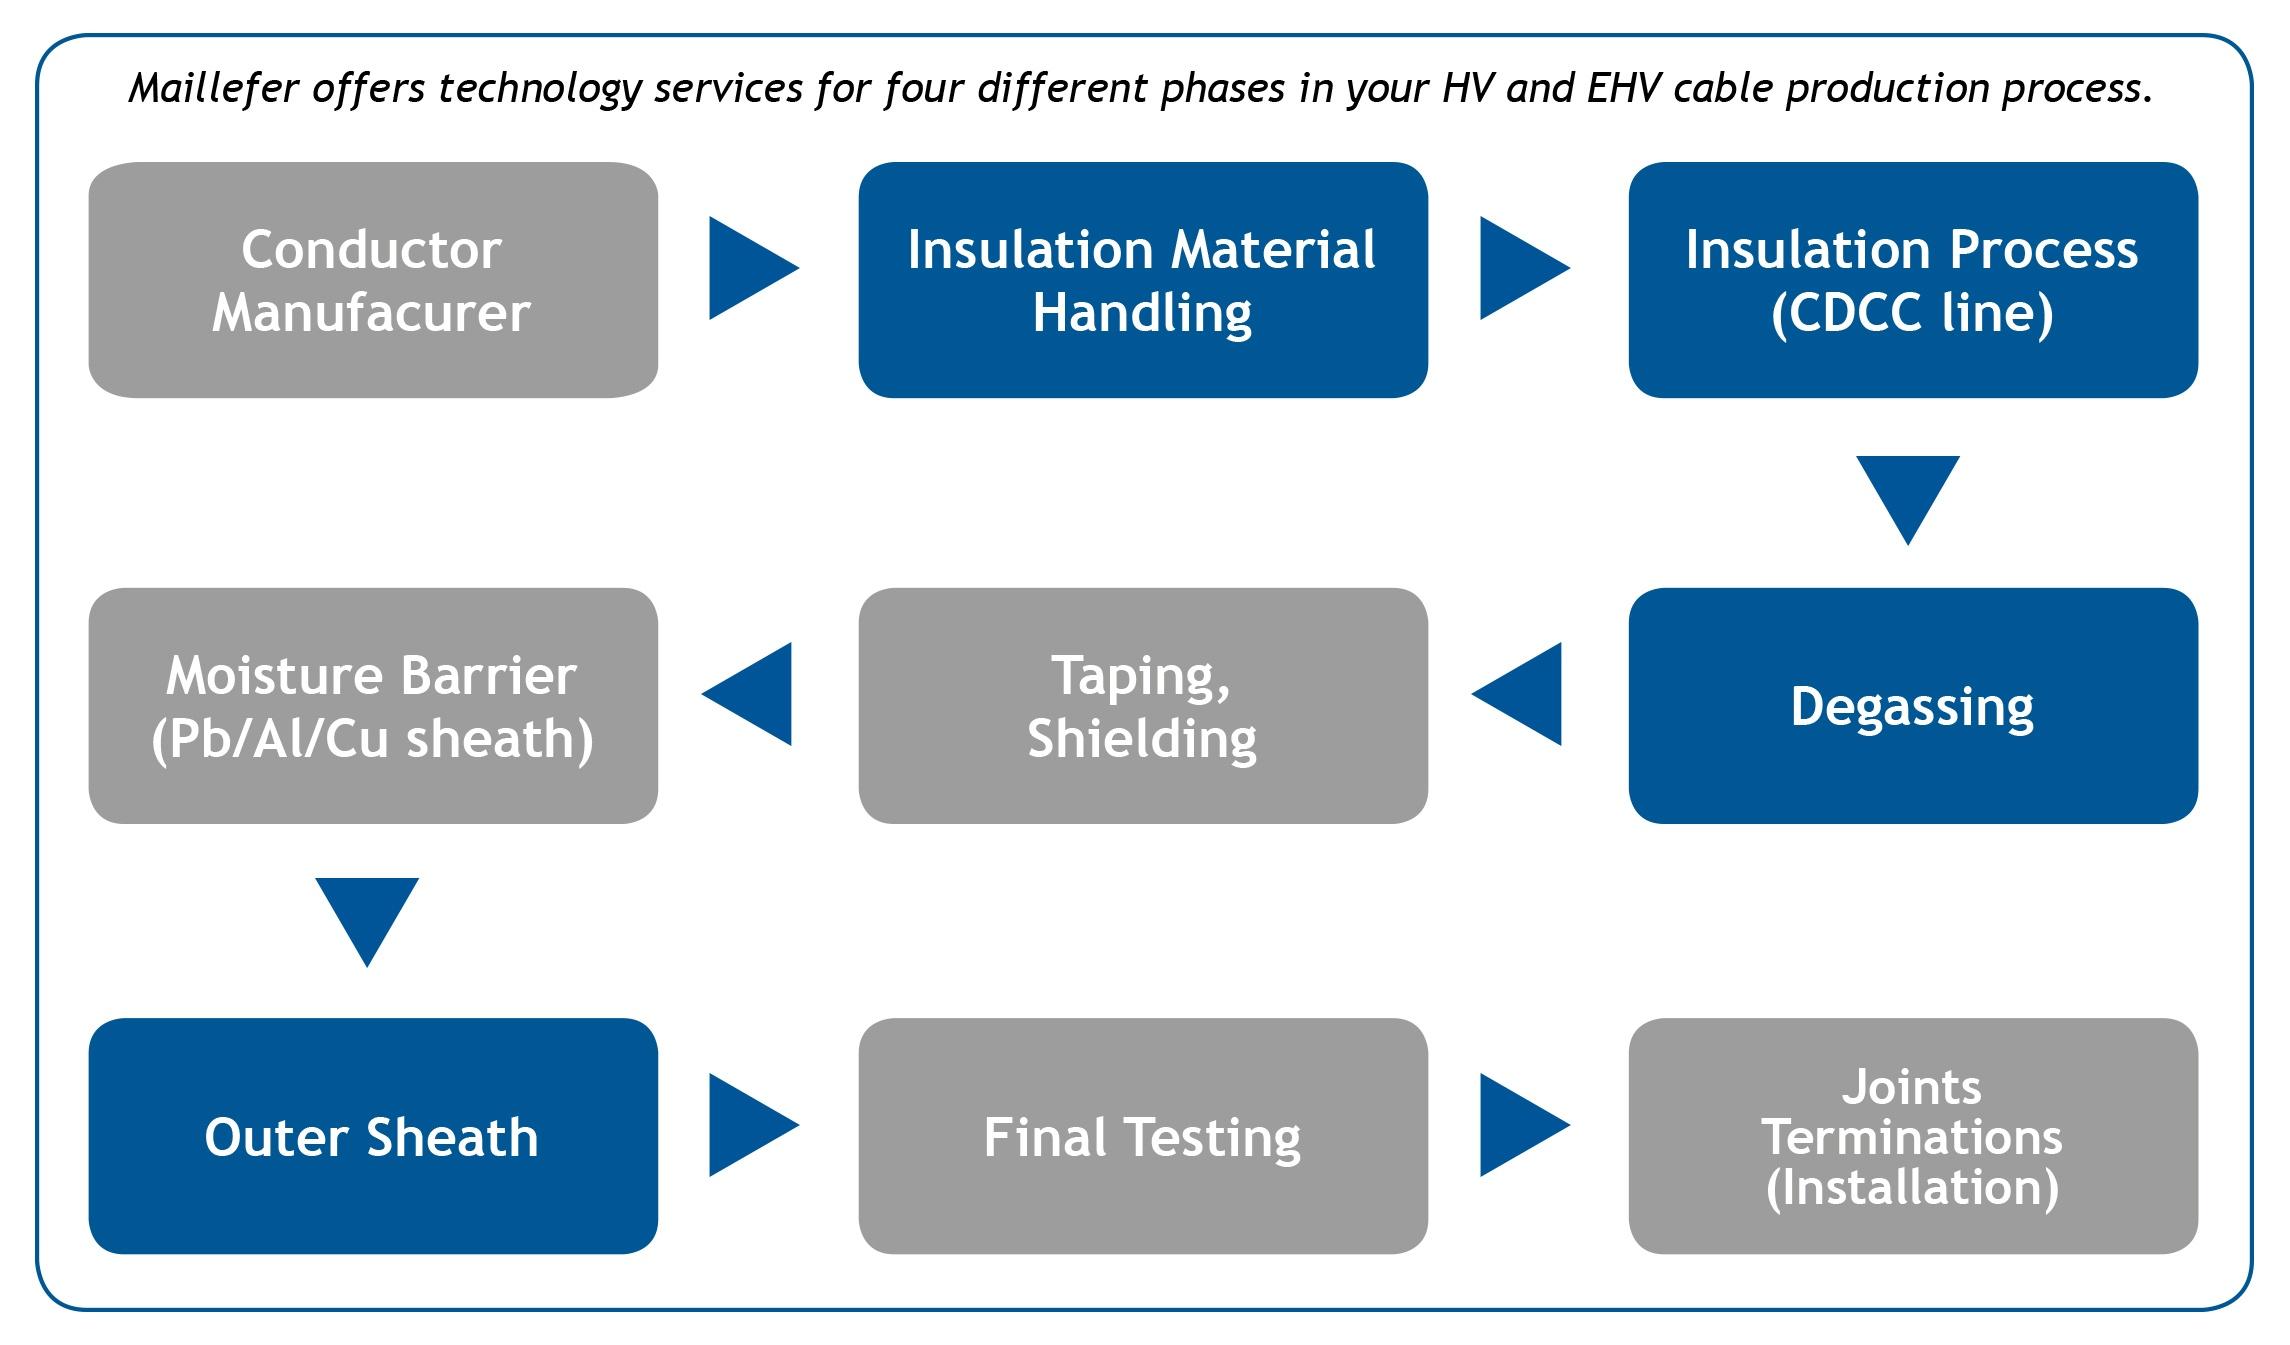 TechnologyServicesProcess_Caption